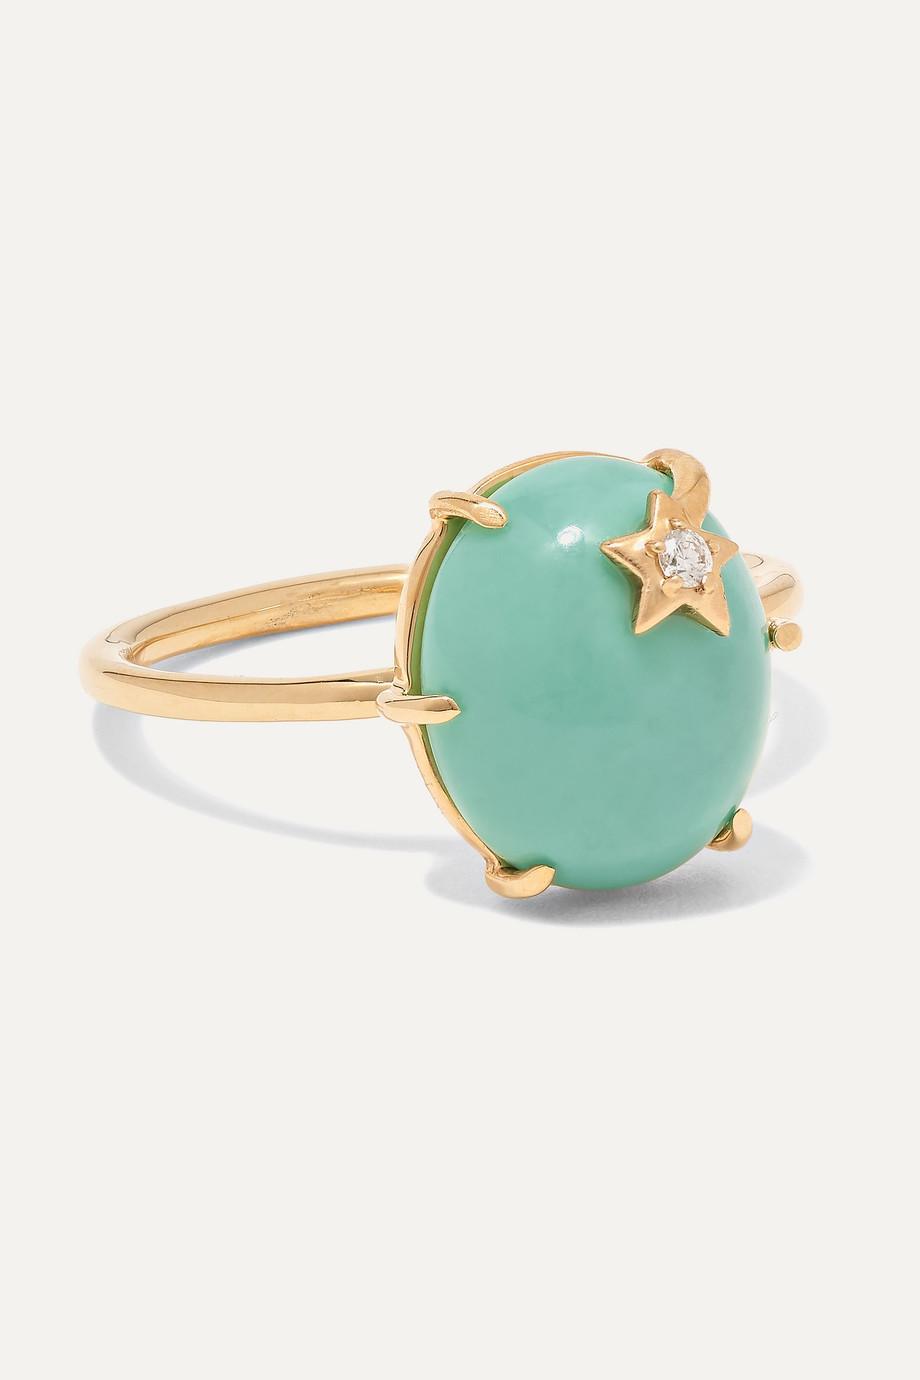 Andrea Fohrman 18-karat gold, turquoise and diamond ring